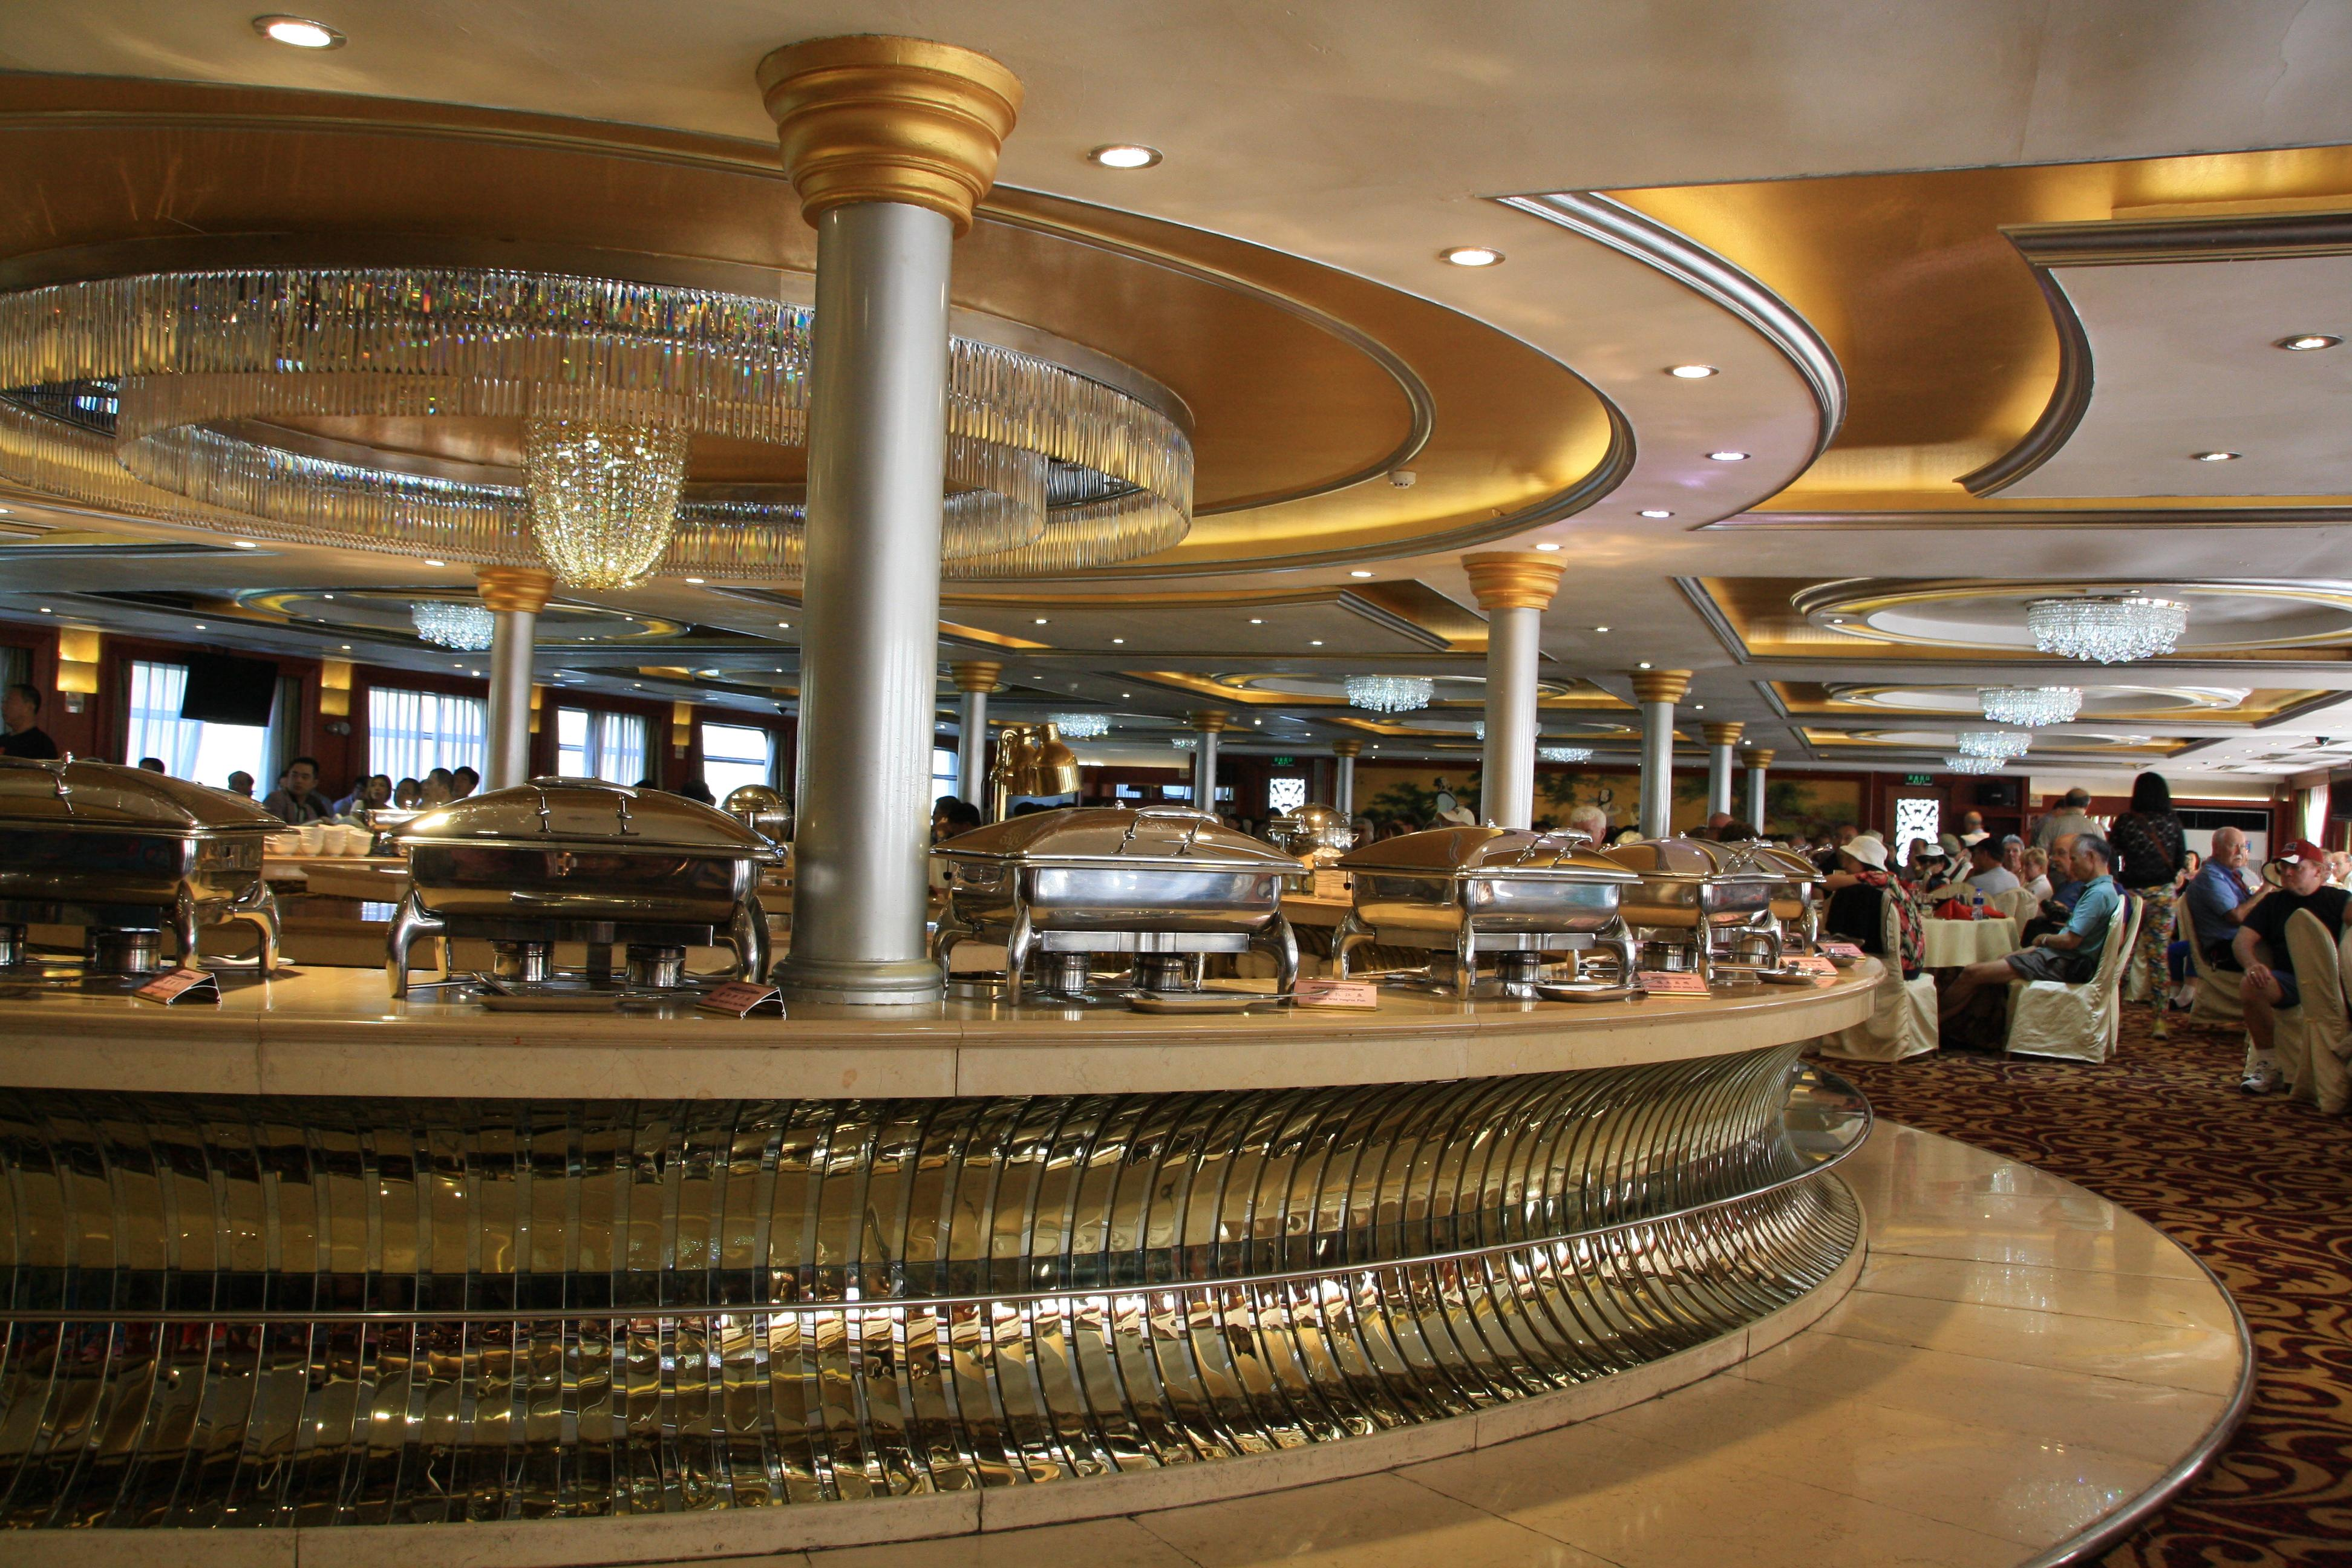 yangtze river cruise's dining